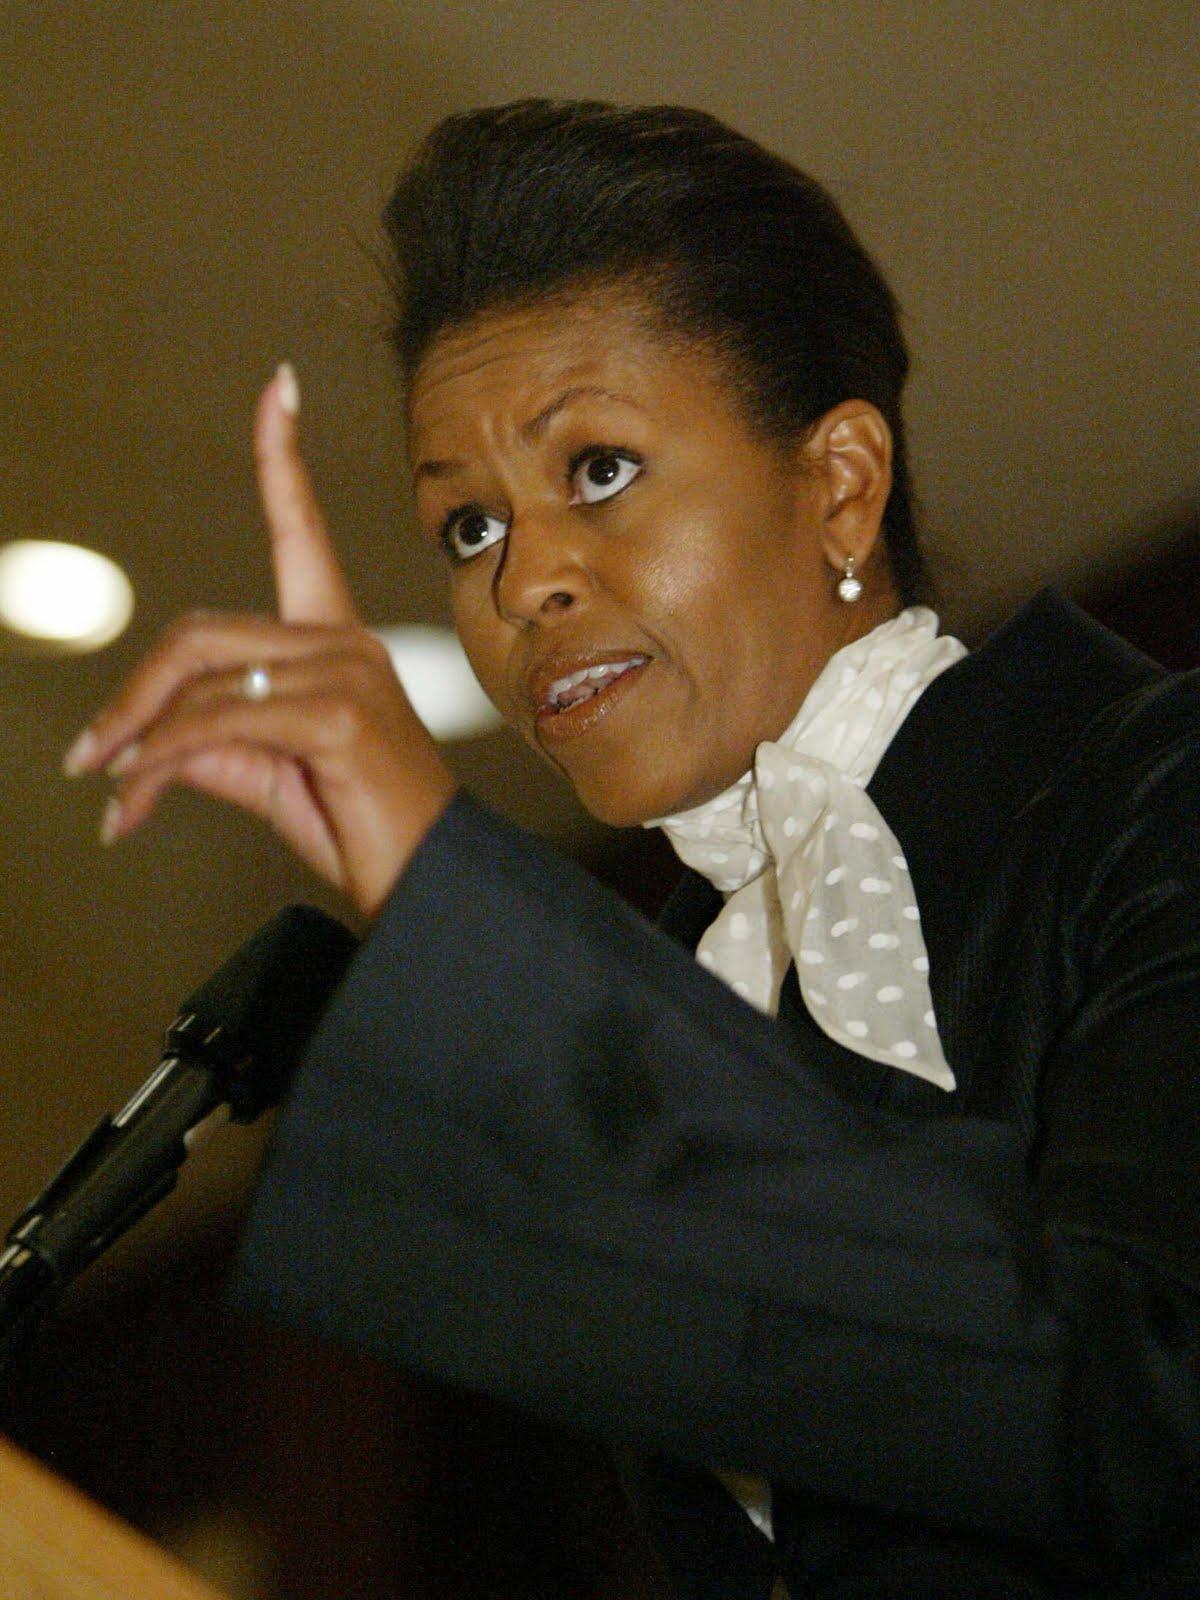 http://4.bp.blogspot.com/_LD_Ah5tLKV8/TEYDchW13SI/AAAAAAAAFz4/q_9aLPs3Lh4/s1600/Michelle_Obama_201.jpg